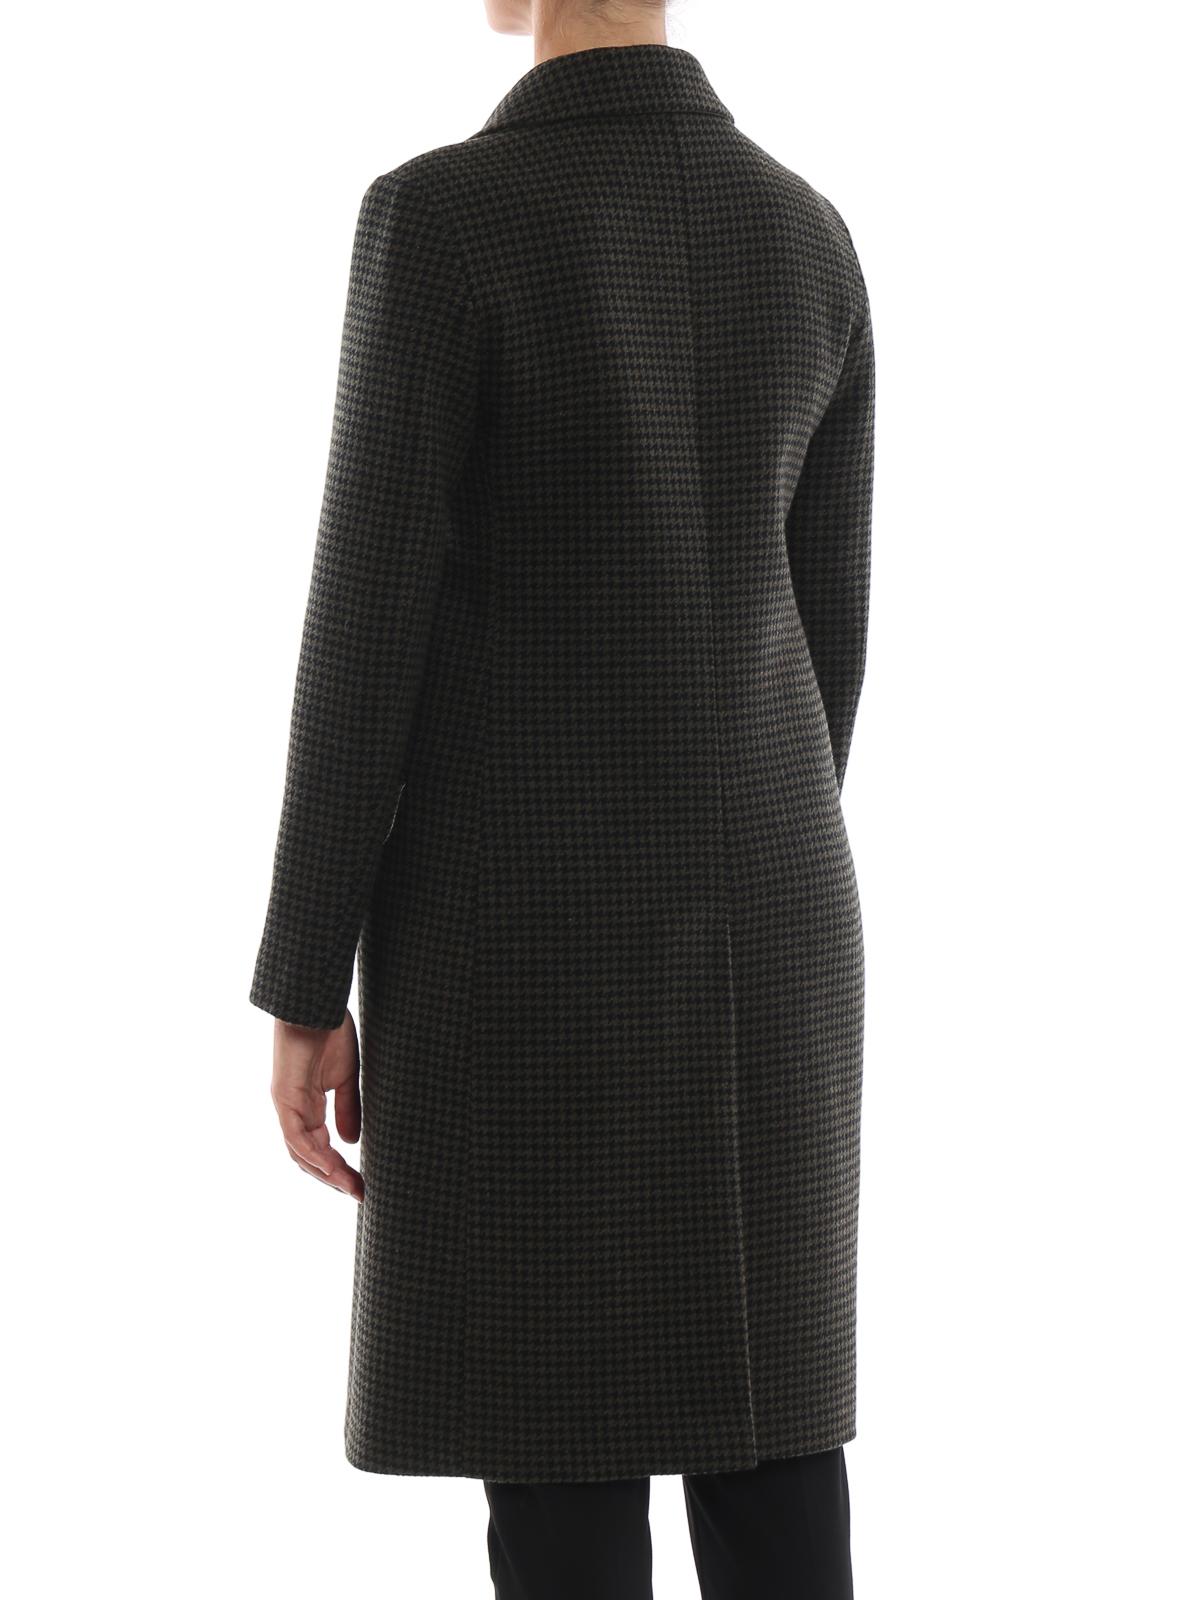 608998376d5d houndstooth-wool-straight-hem-coat-shop-online-etro-00000138069f00s004.jpg